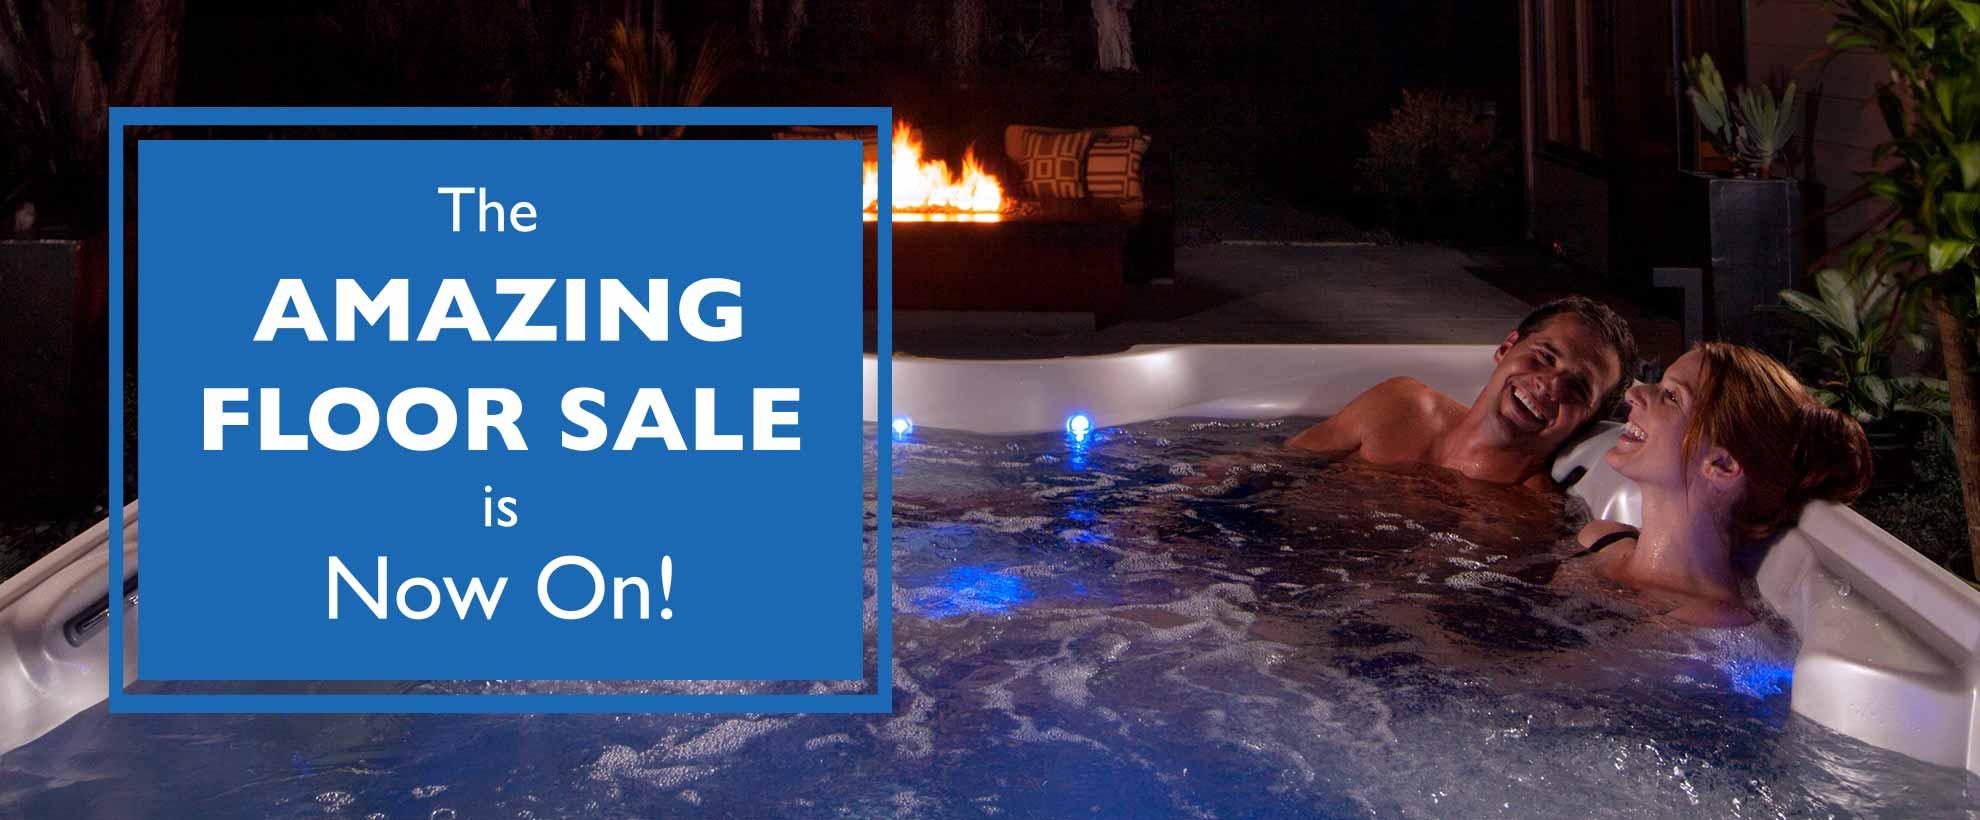 The Amazing Floor Model Sale